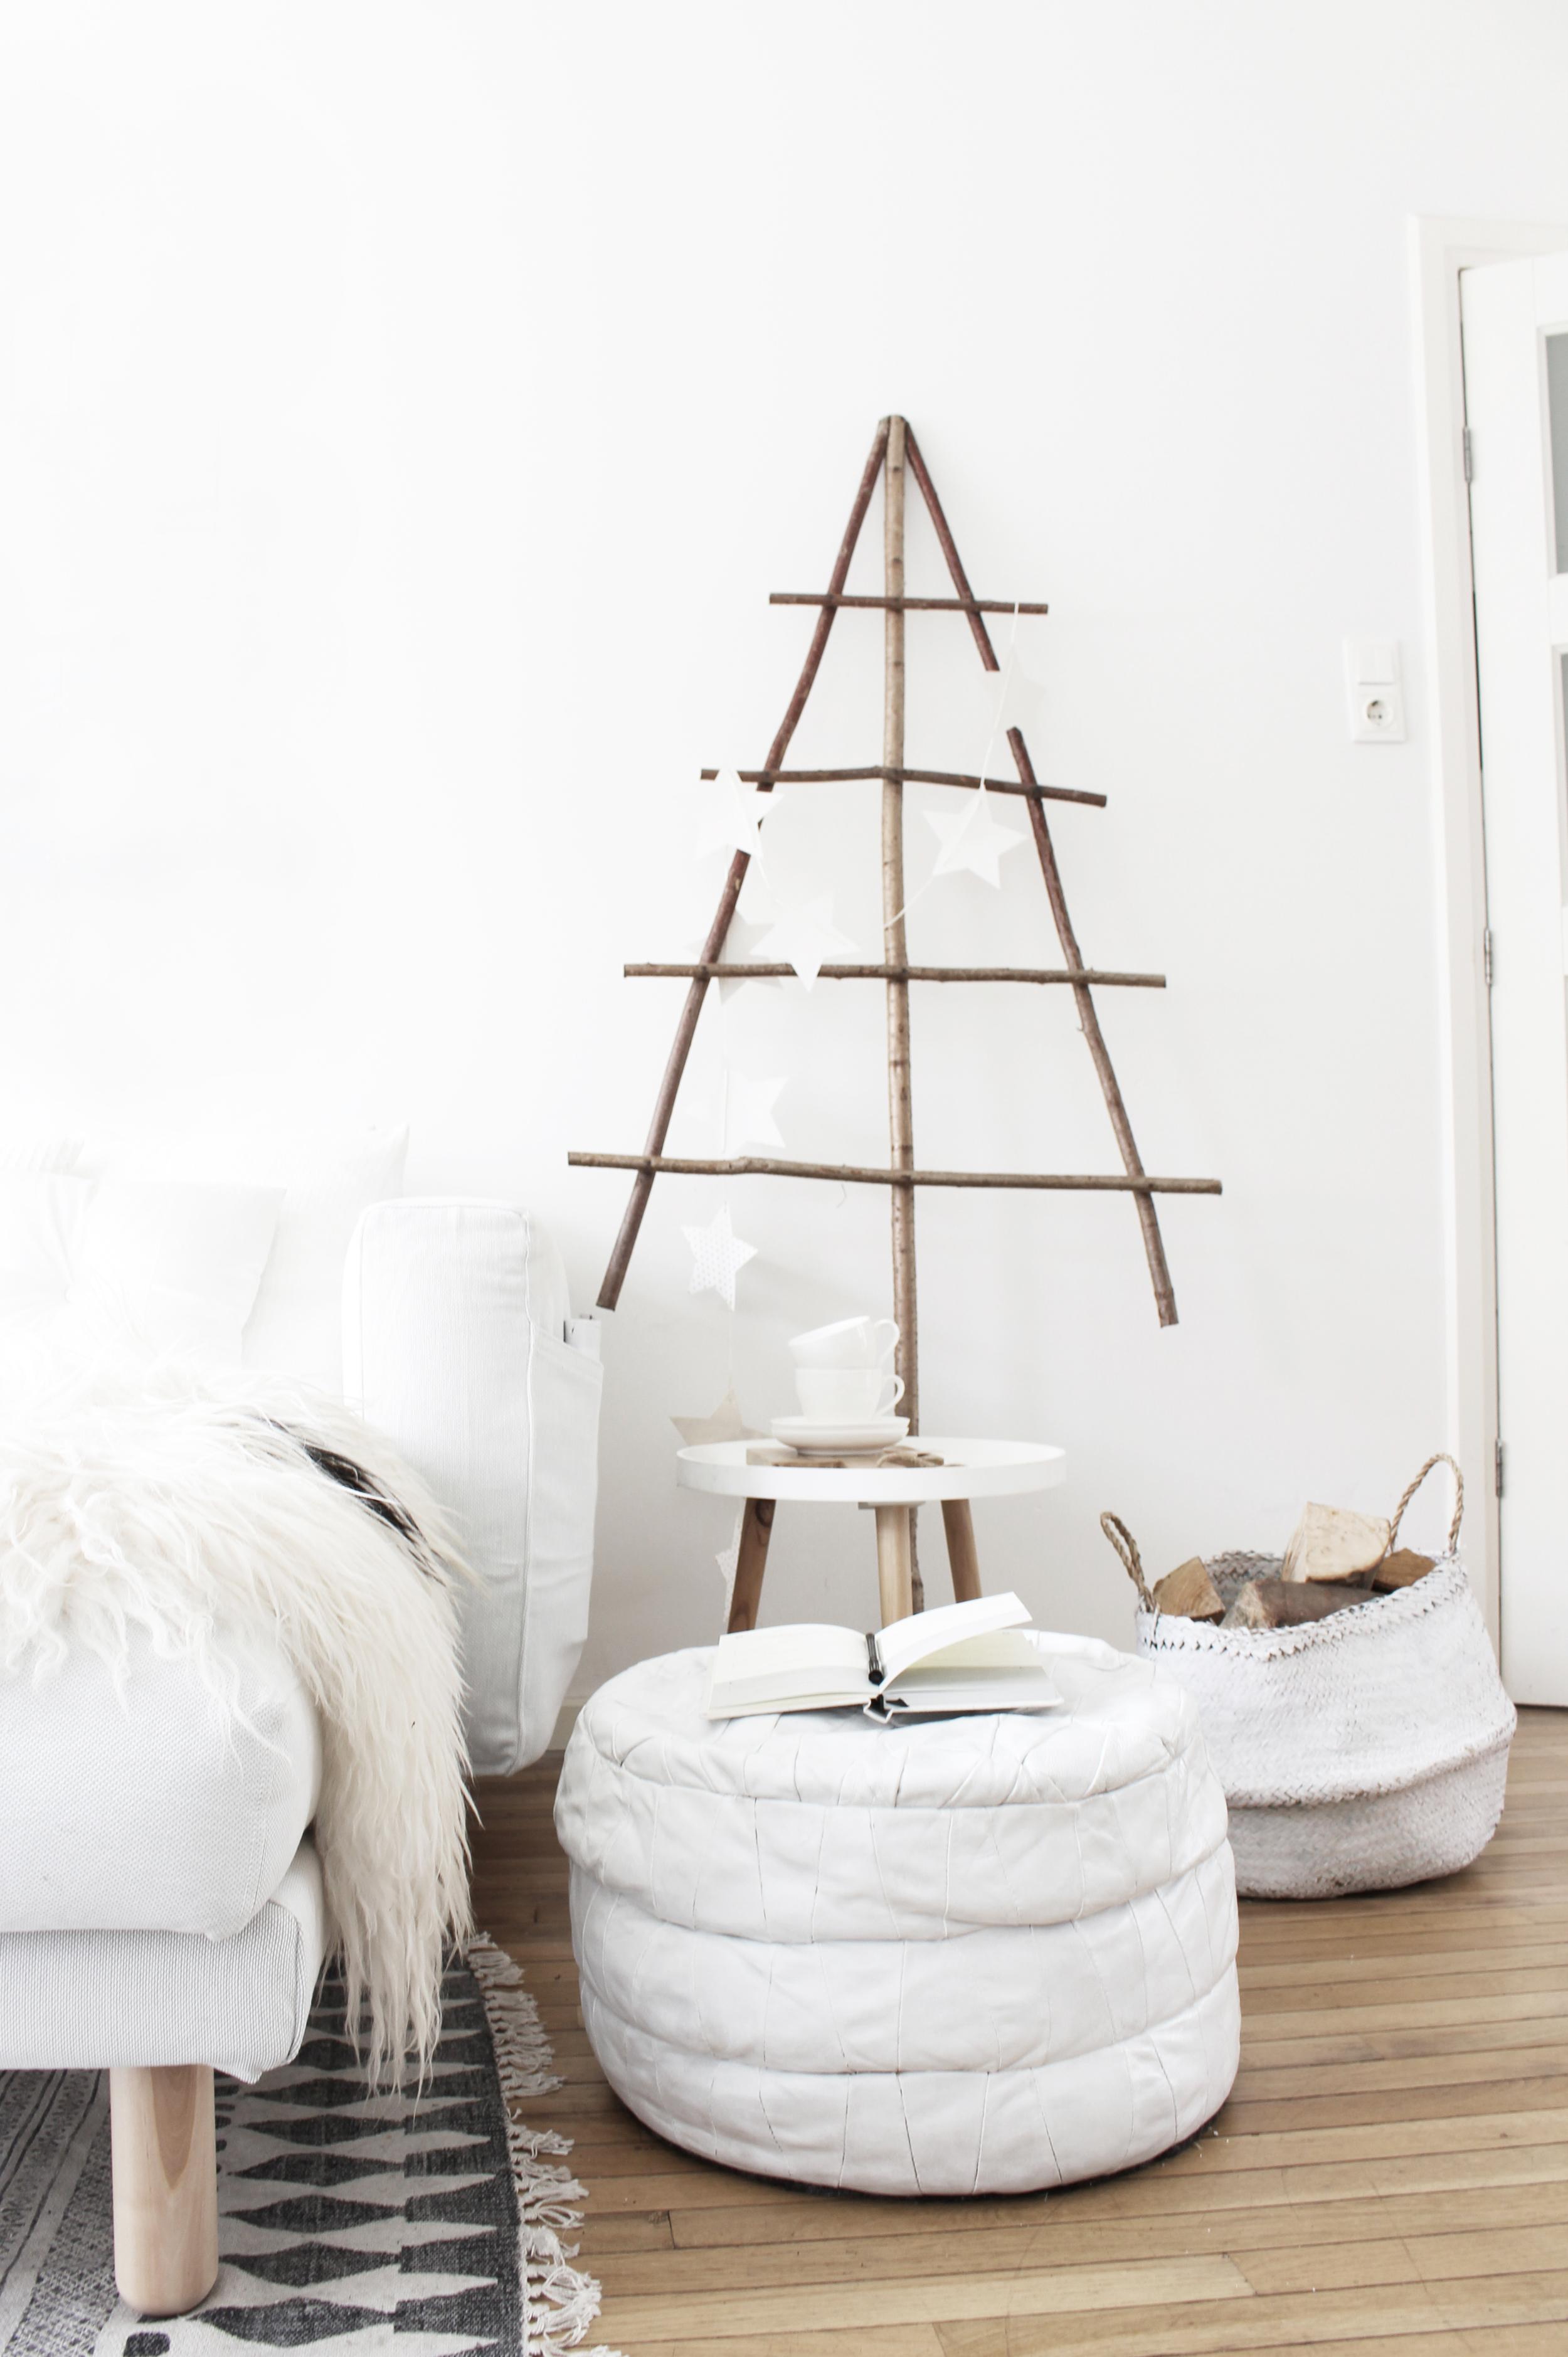 Kerstboom: ByDennis Bank:  Ikea  Kleed:  House Doctor